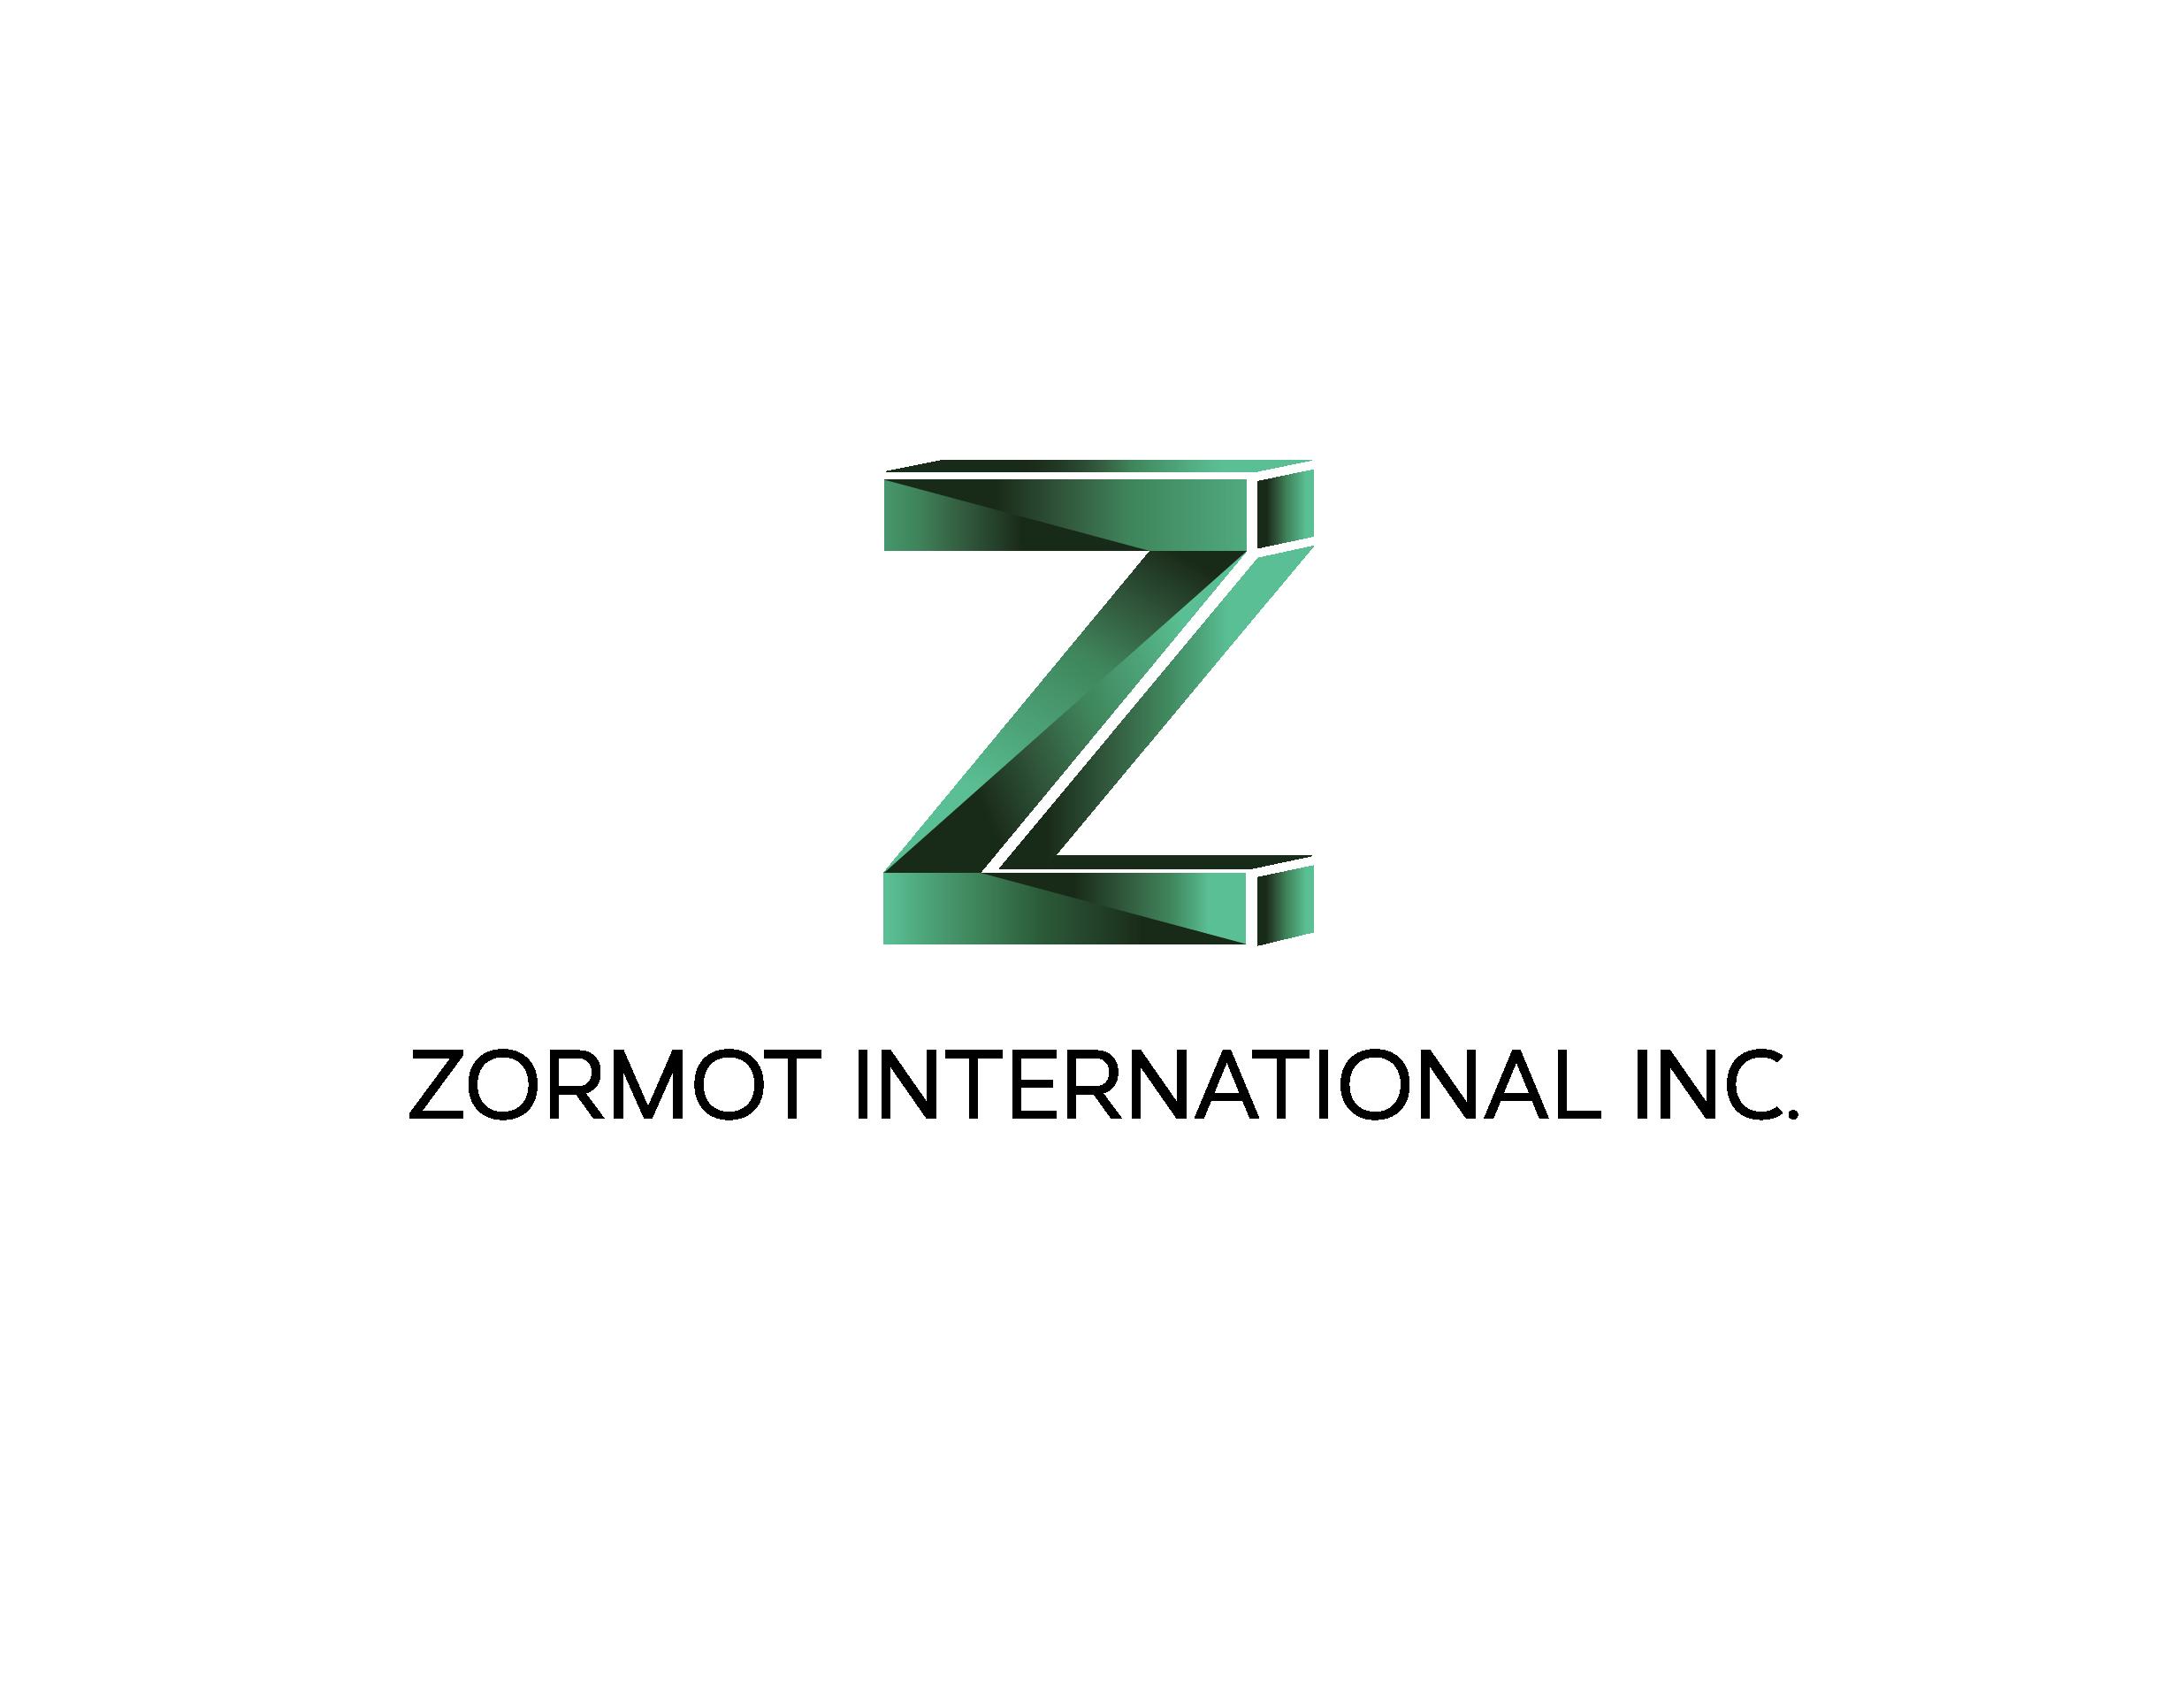 Zormot International Inc.